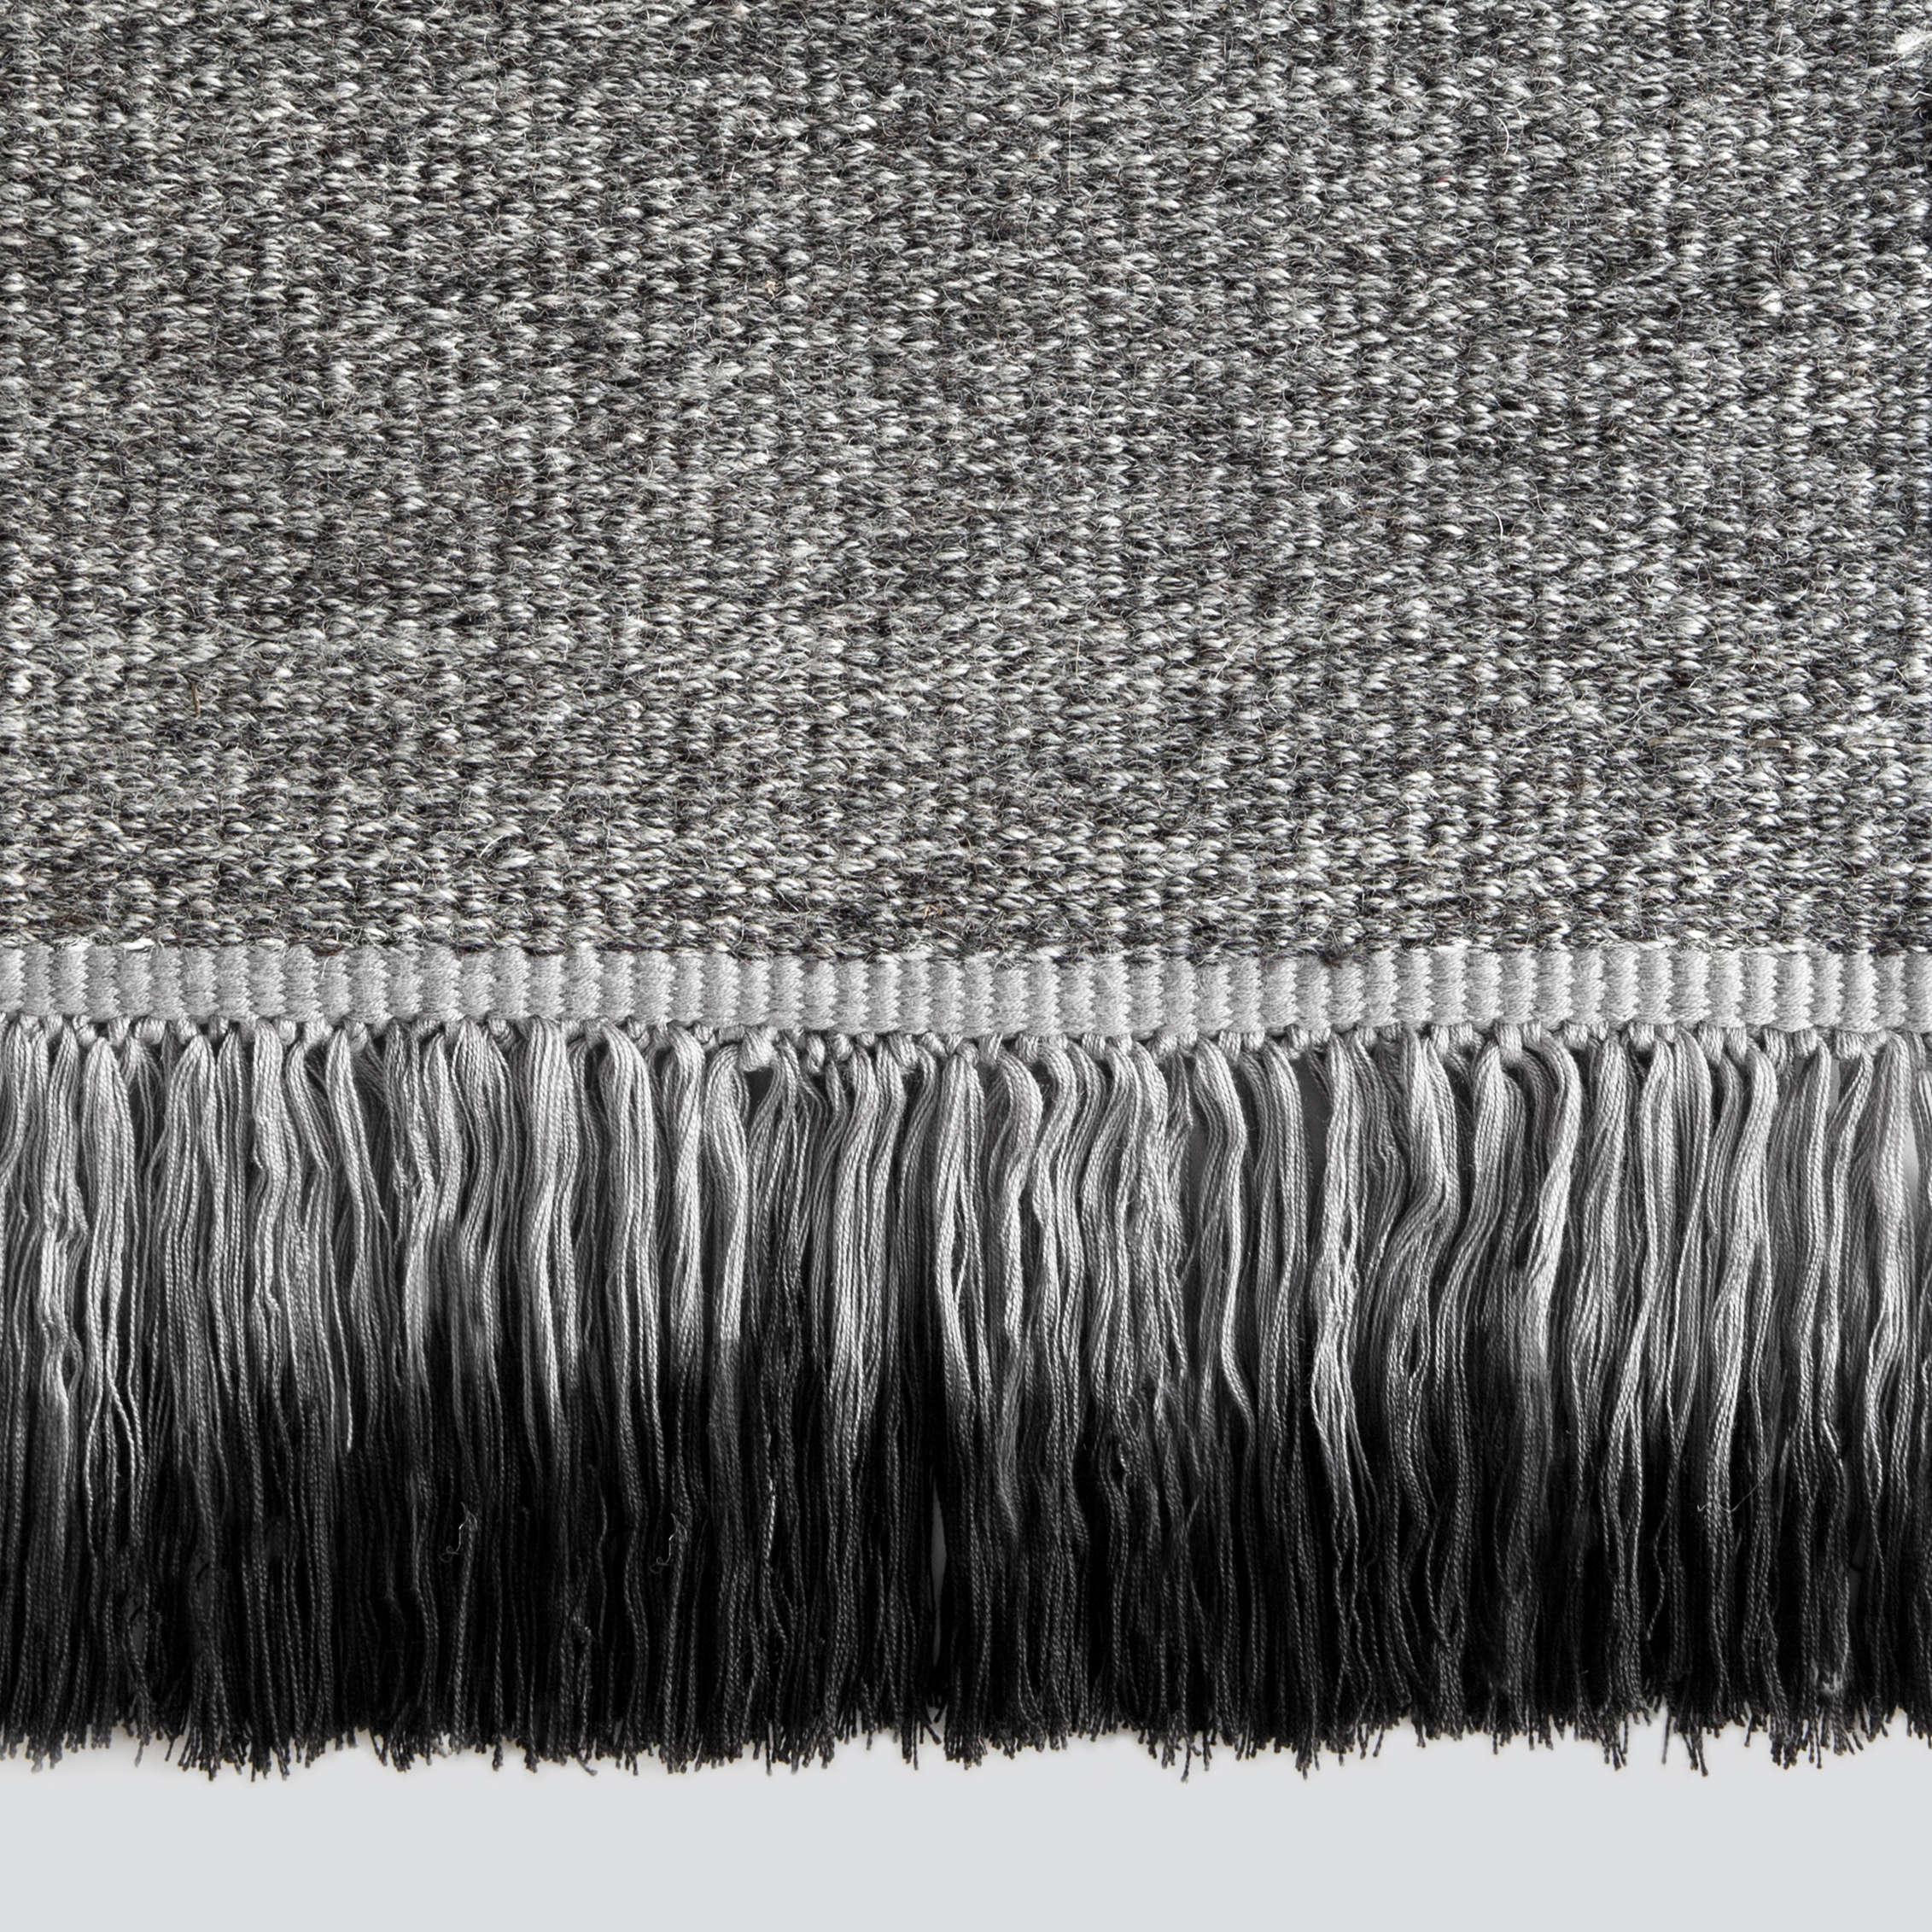 Black And White Tassel Rug: Dip-Dyed Fringe Rugs From Sweden: Remodelista